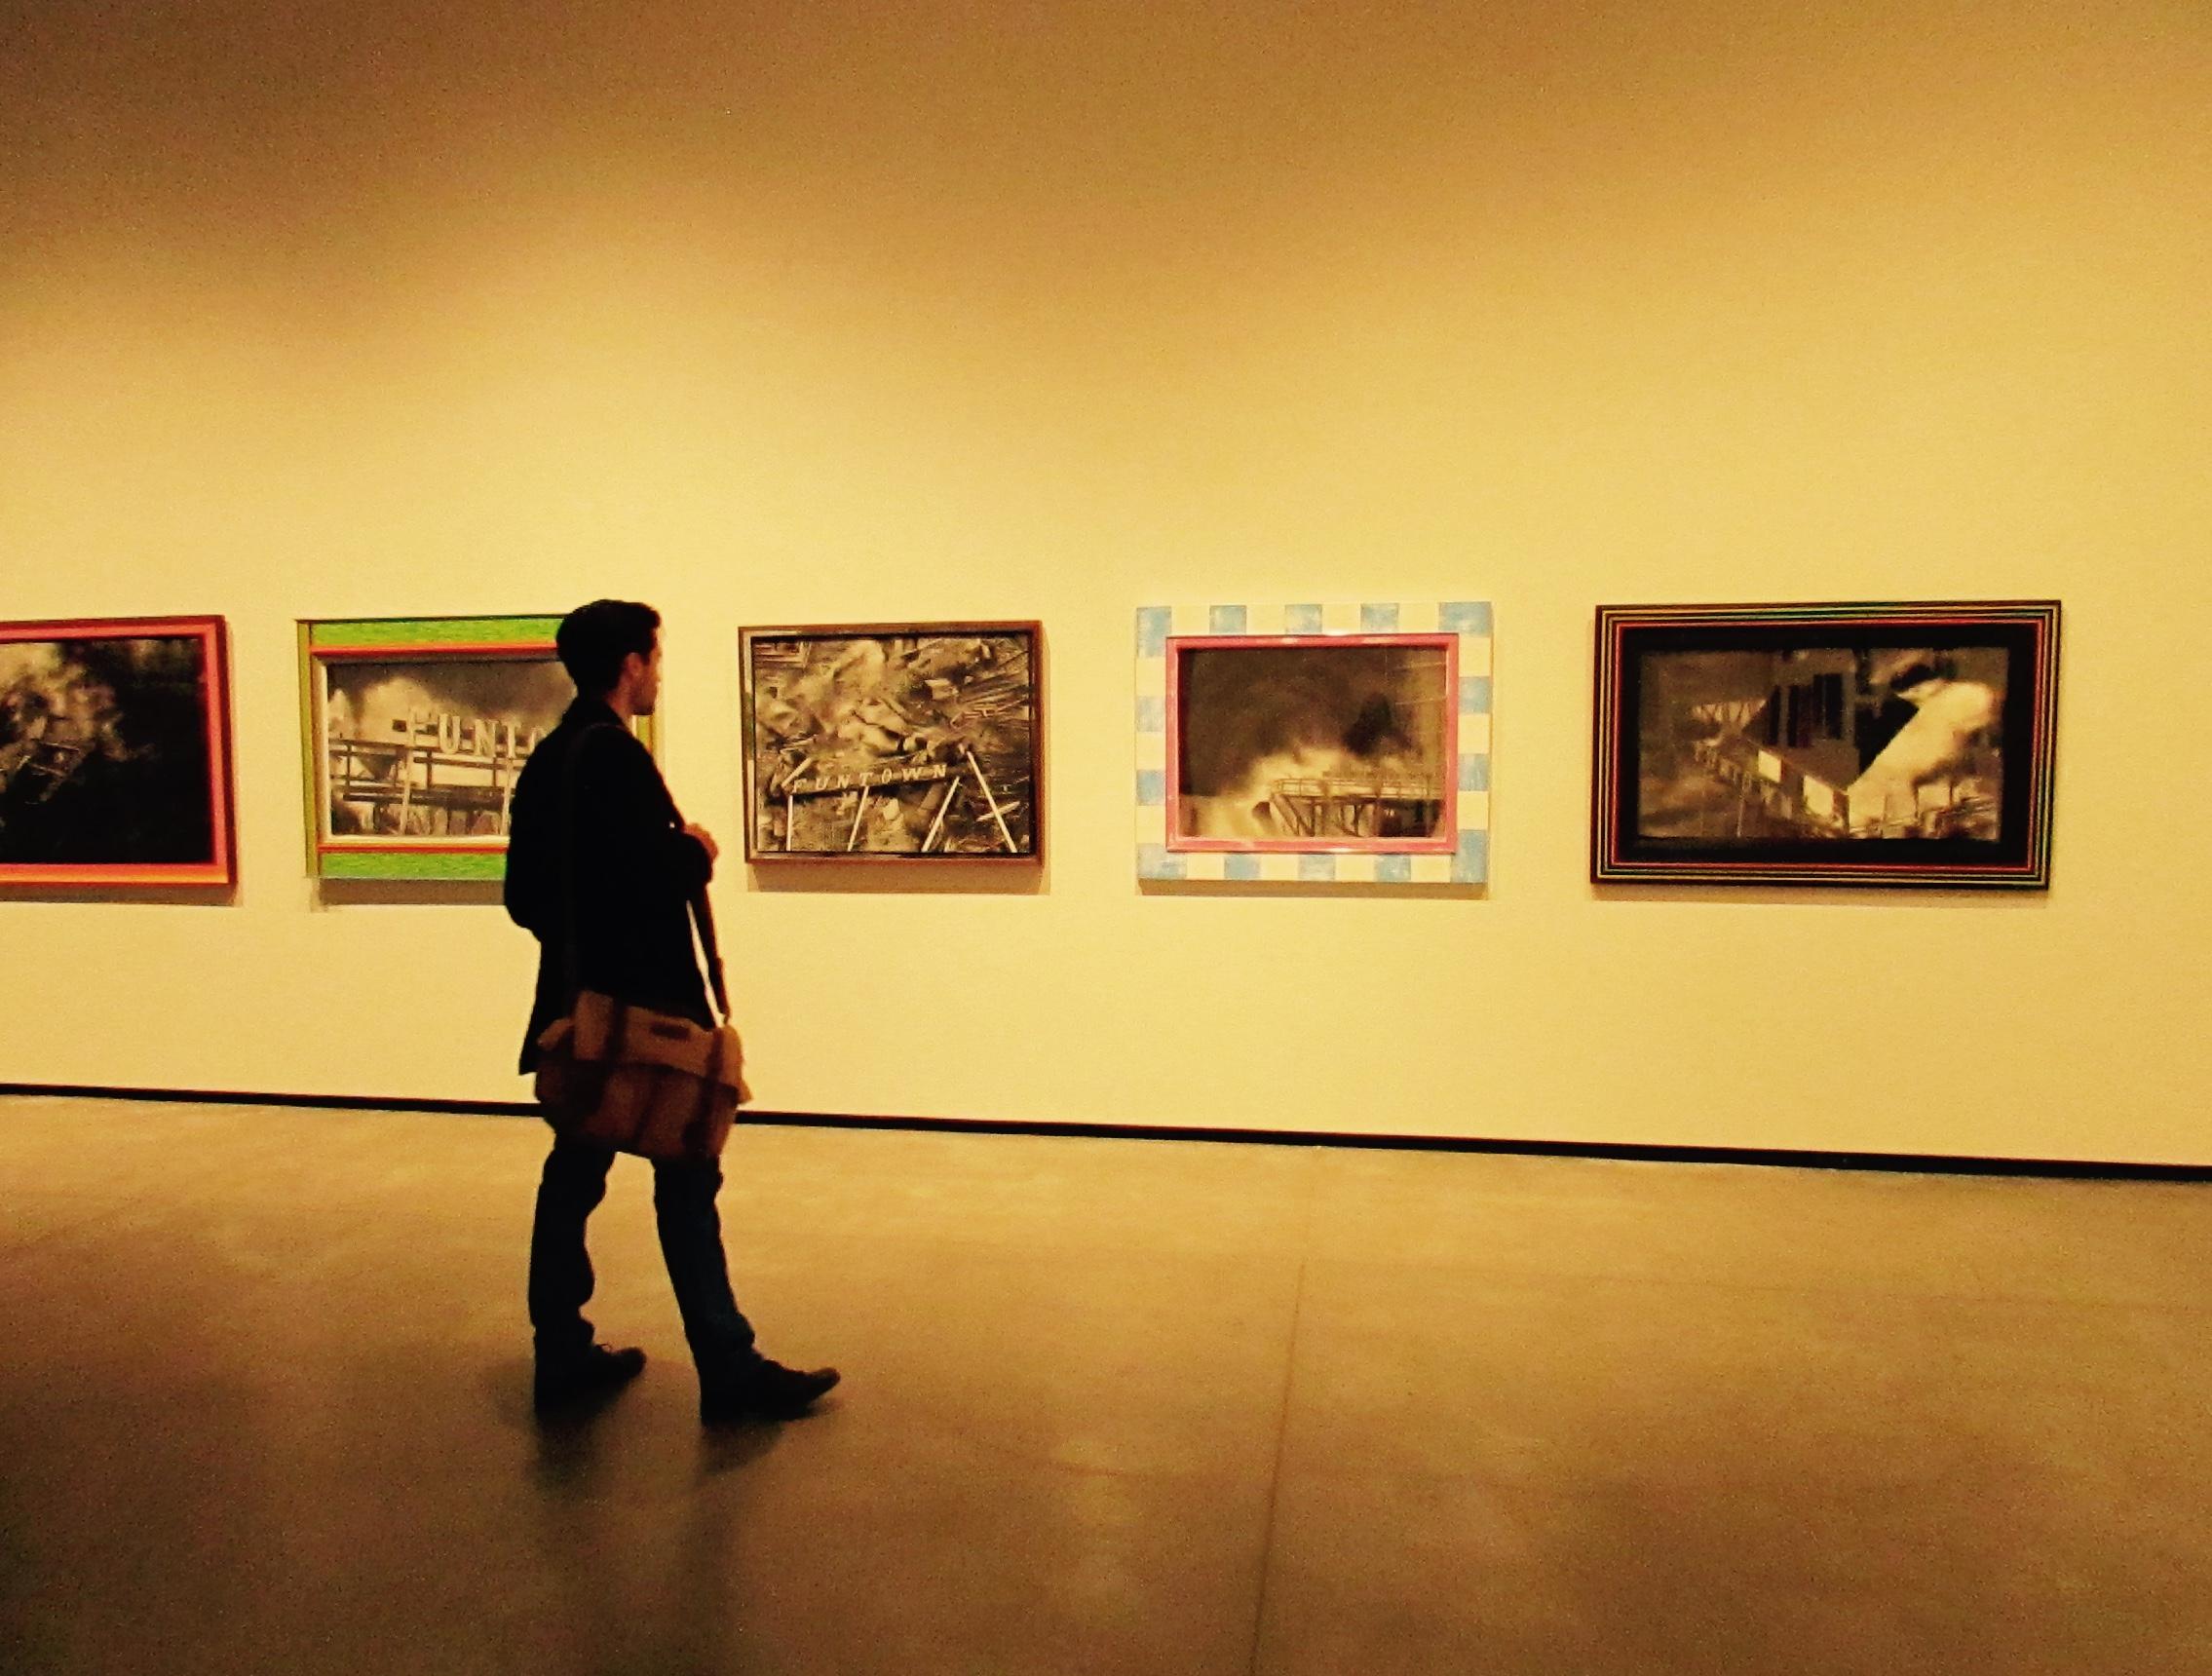 A contemporary exhibit at the Art Gallery of Alberta in Edmonton, Canada